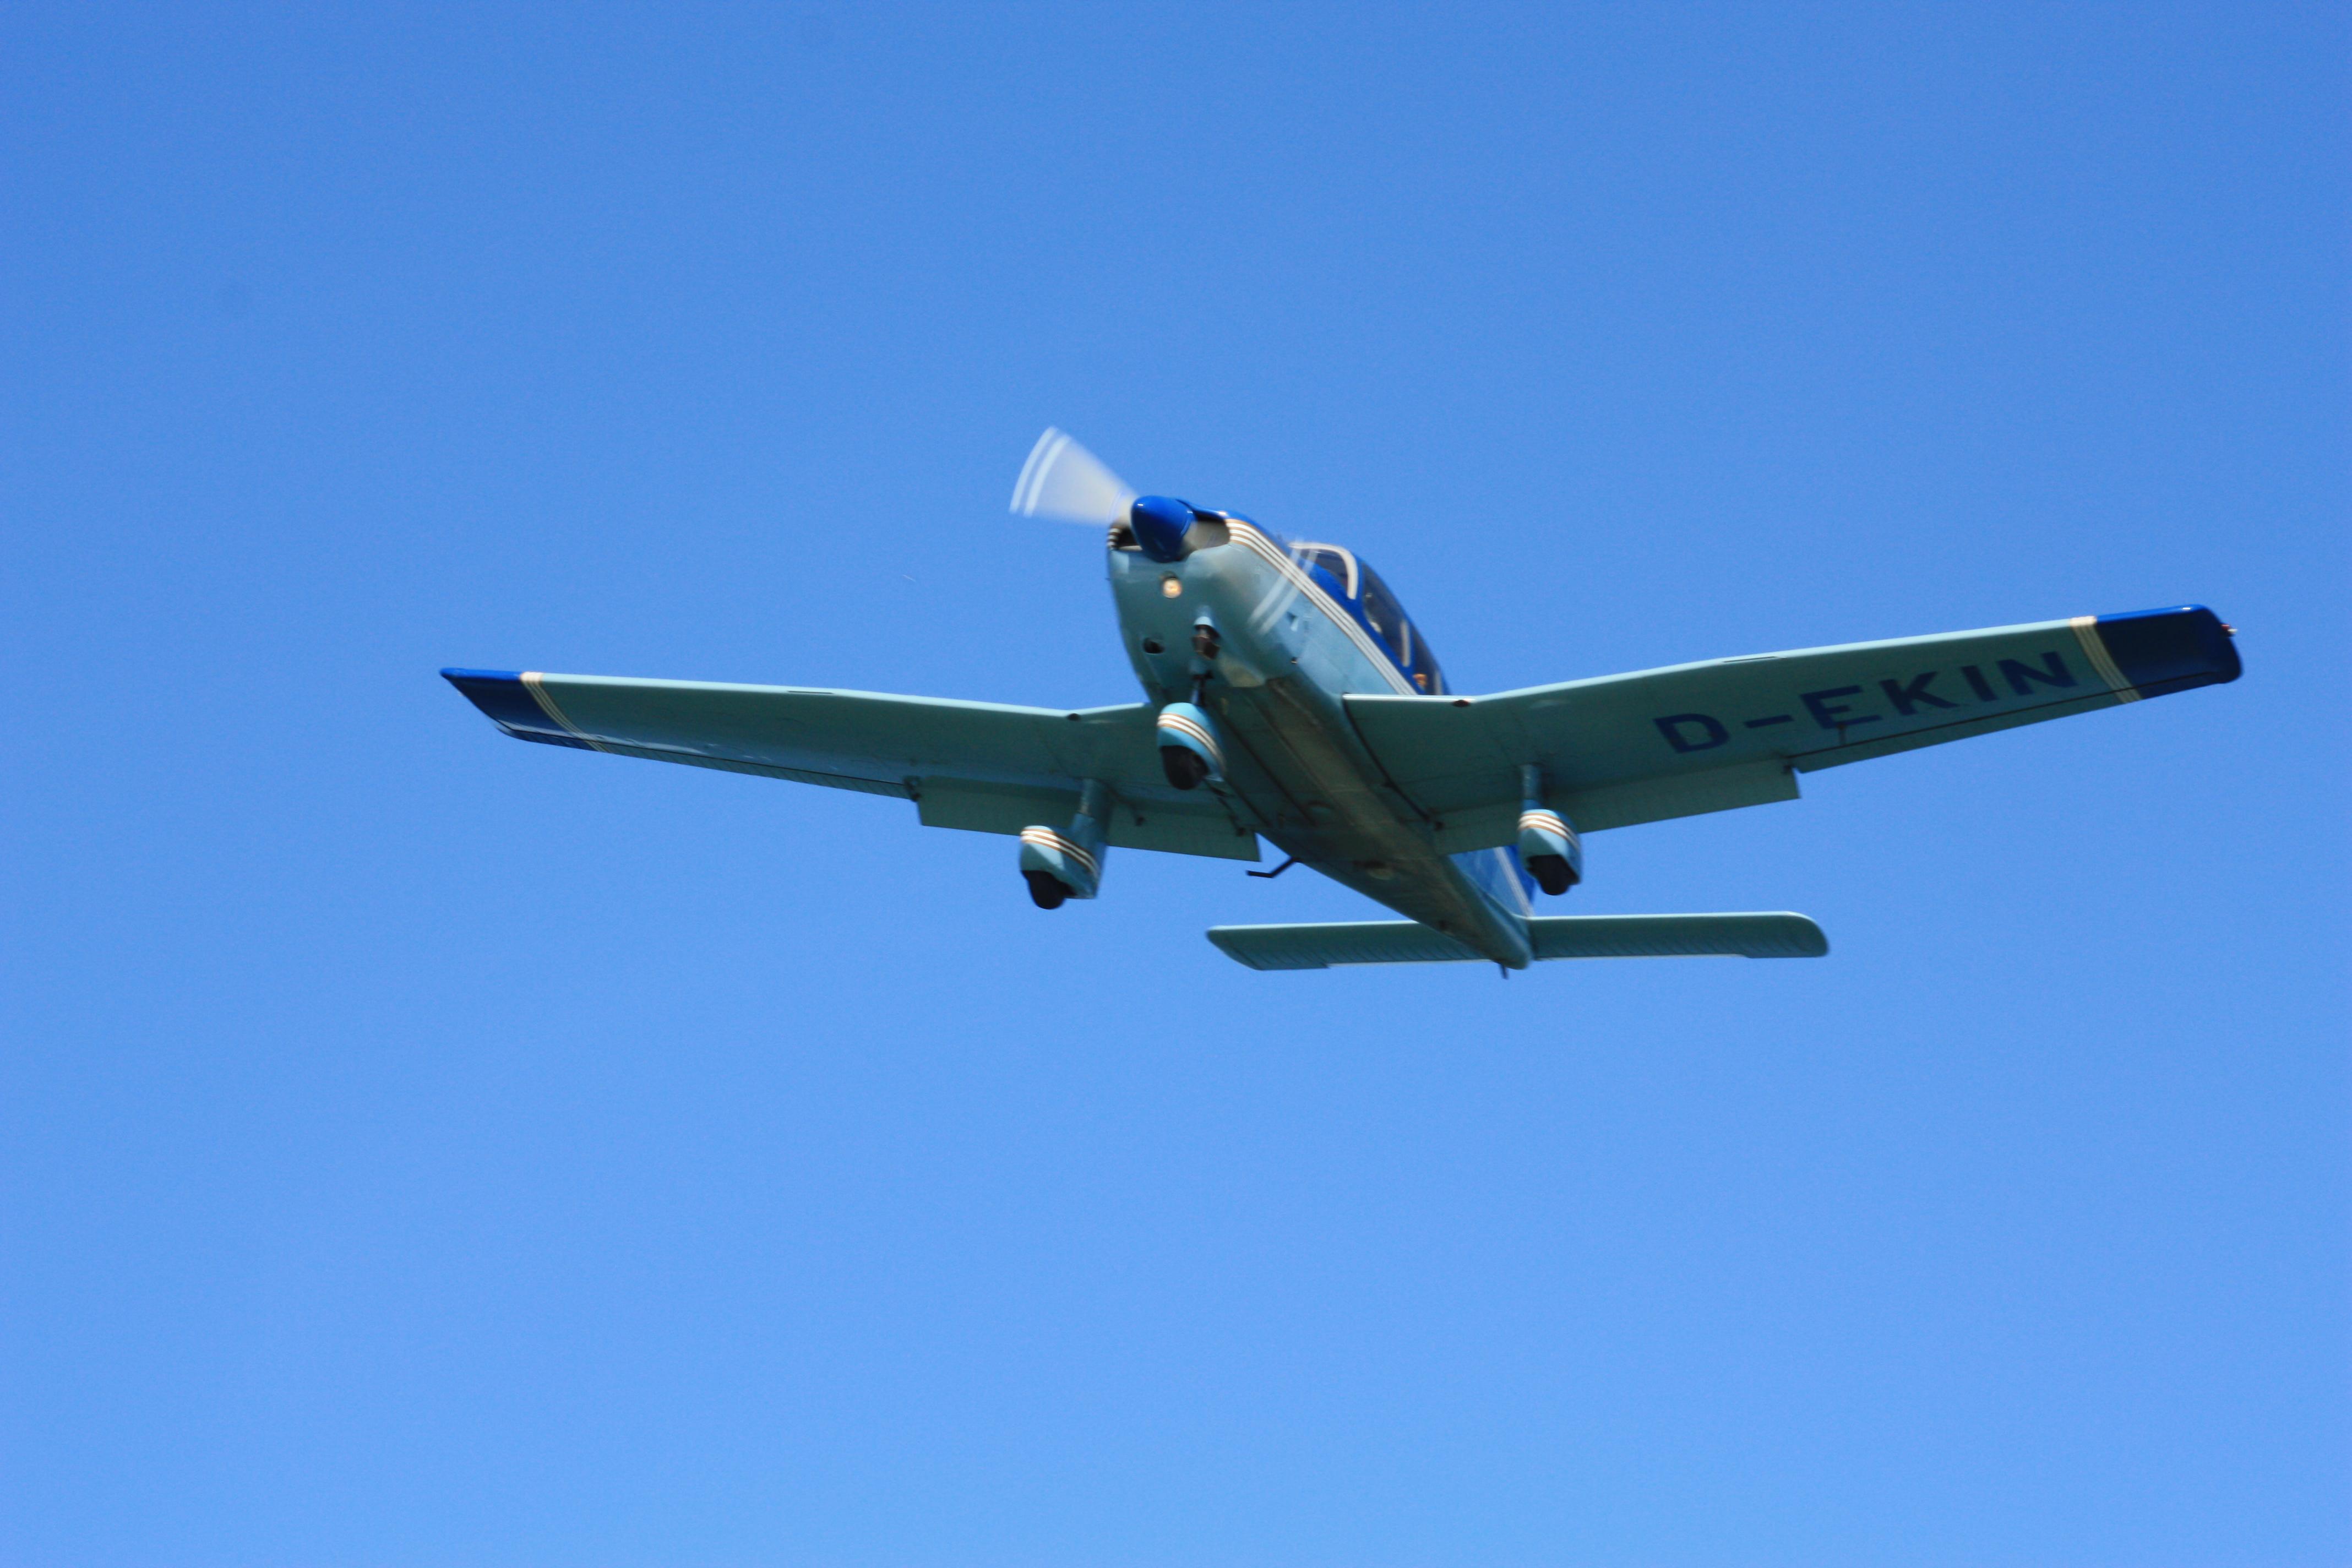 piper aircraft wallpaper the - photo #33